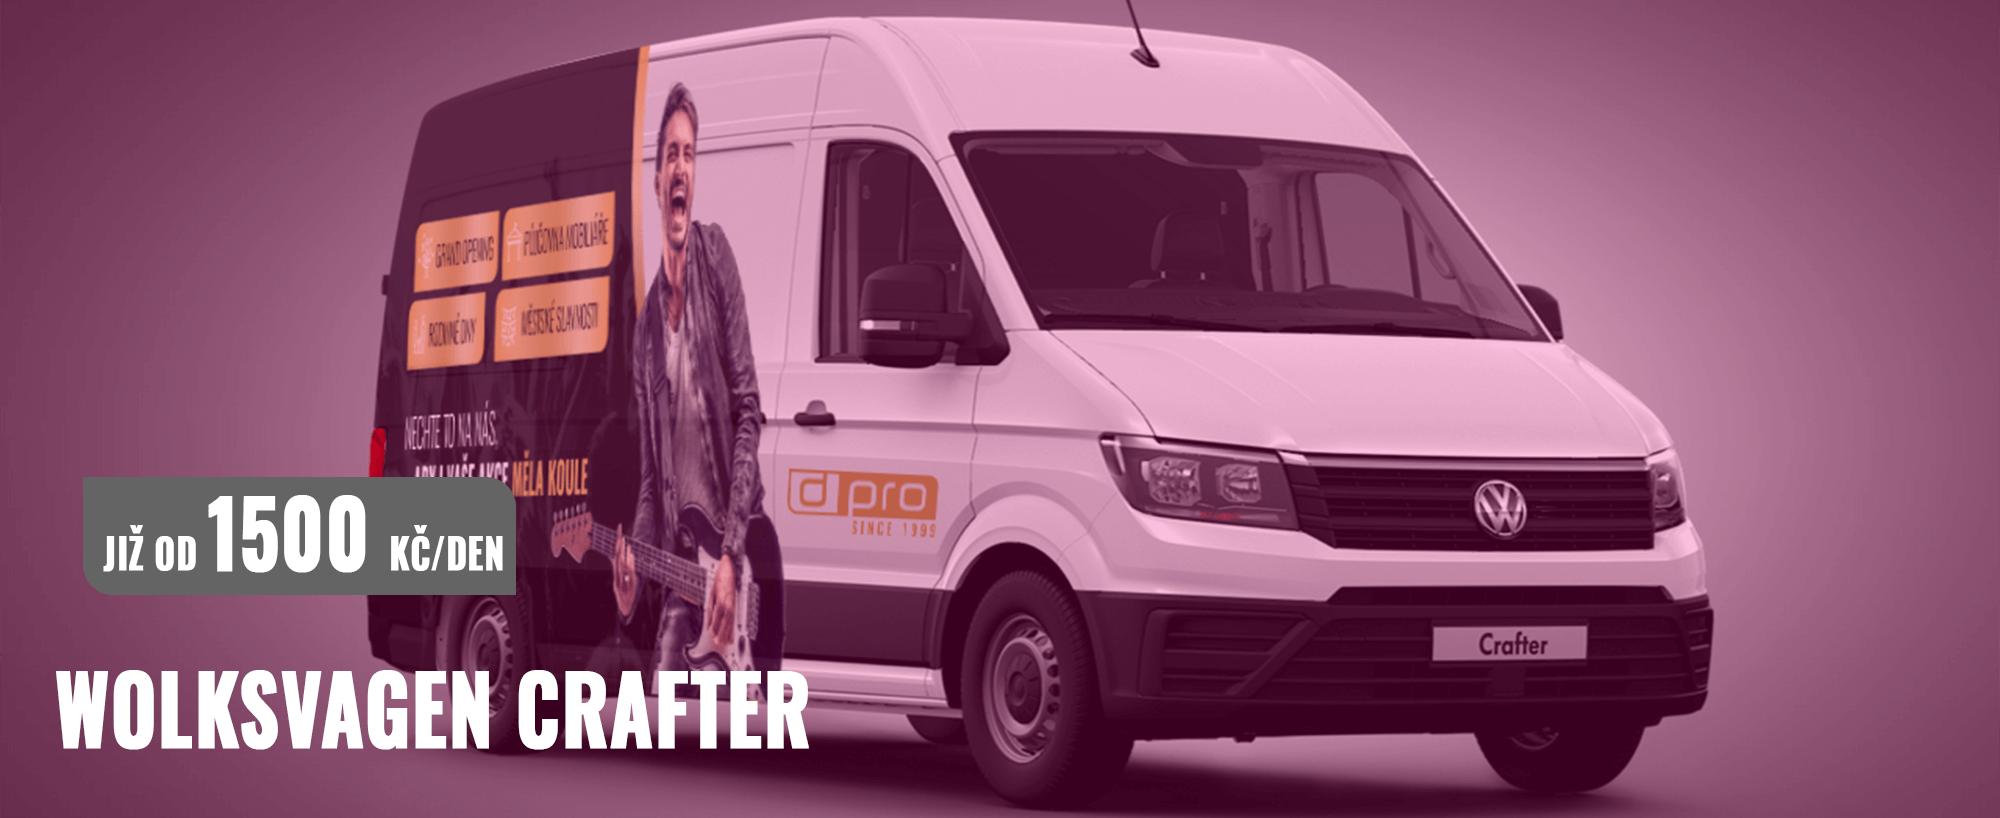 Dream PRO - Půjčovna užitkových vozů - Crafter